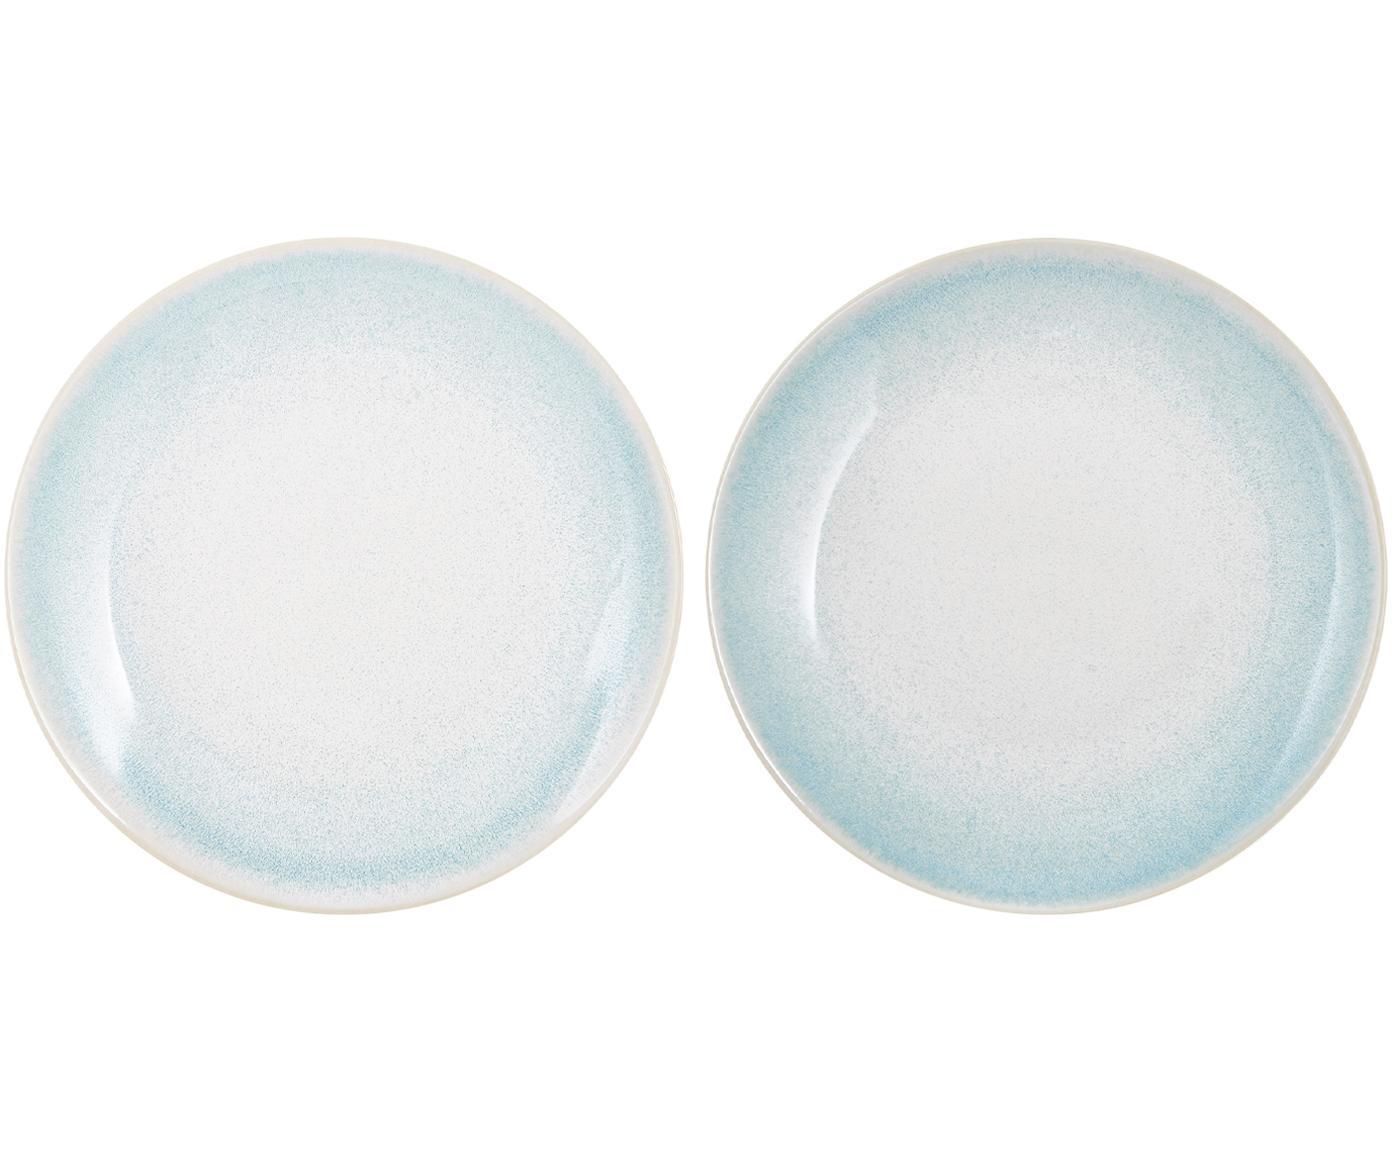 Platos postre artesanales Amalia, 2uds., Cerámica, Azul claro, blanco crema, Ø 20 cm